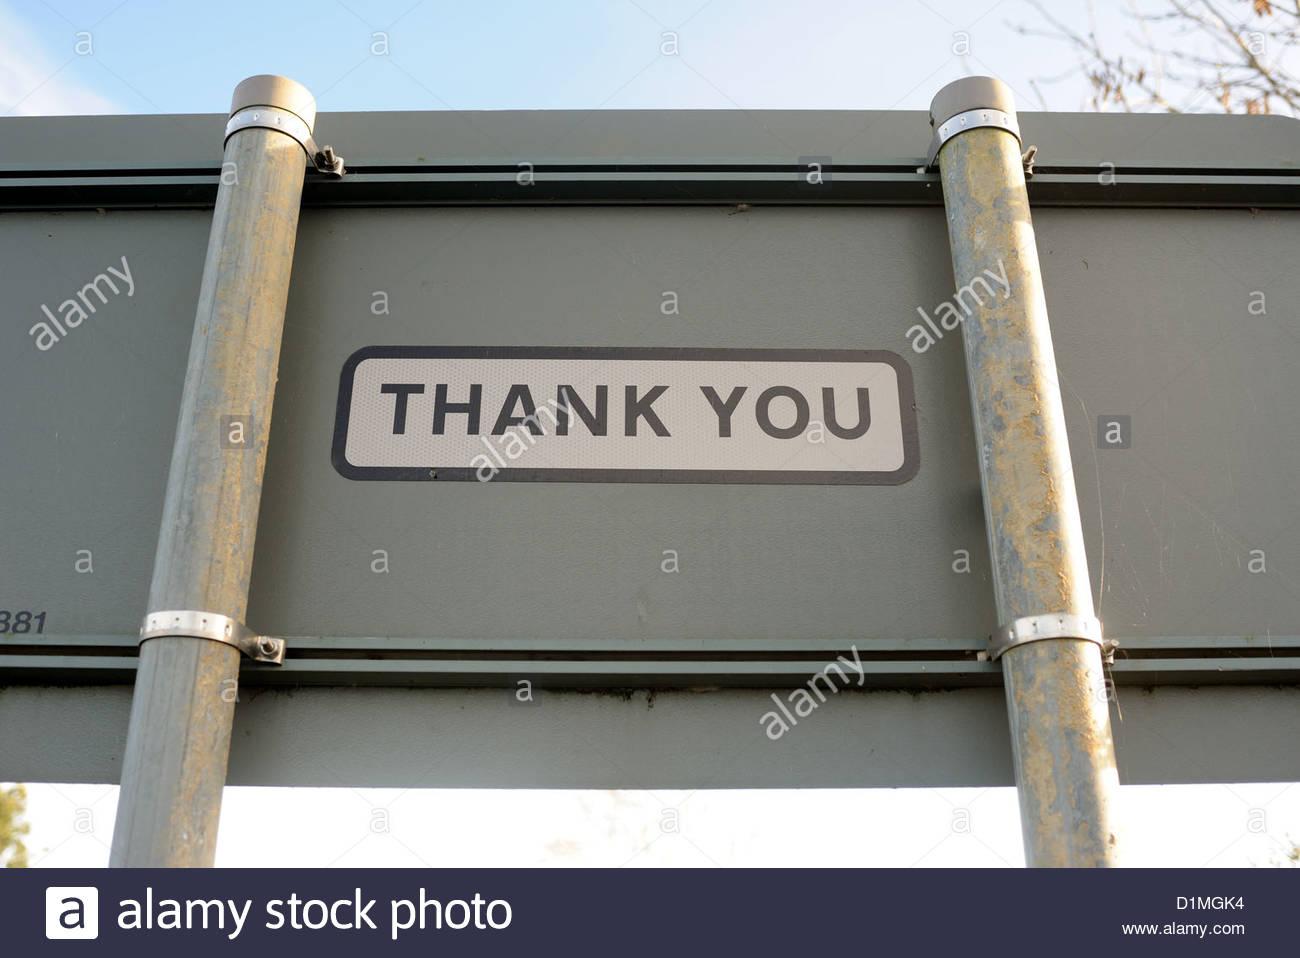 Moreton nr Bourne Lincs UK. Road sign - Thank you. - Stock Image